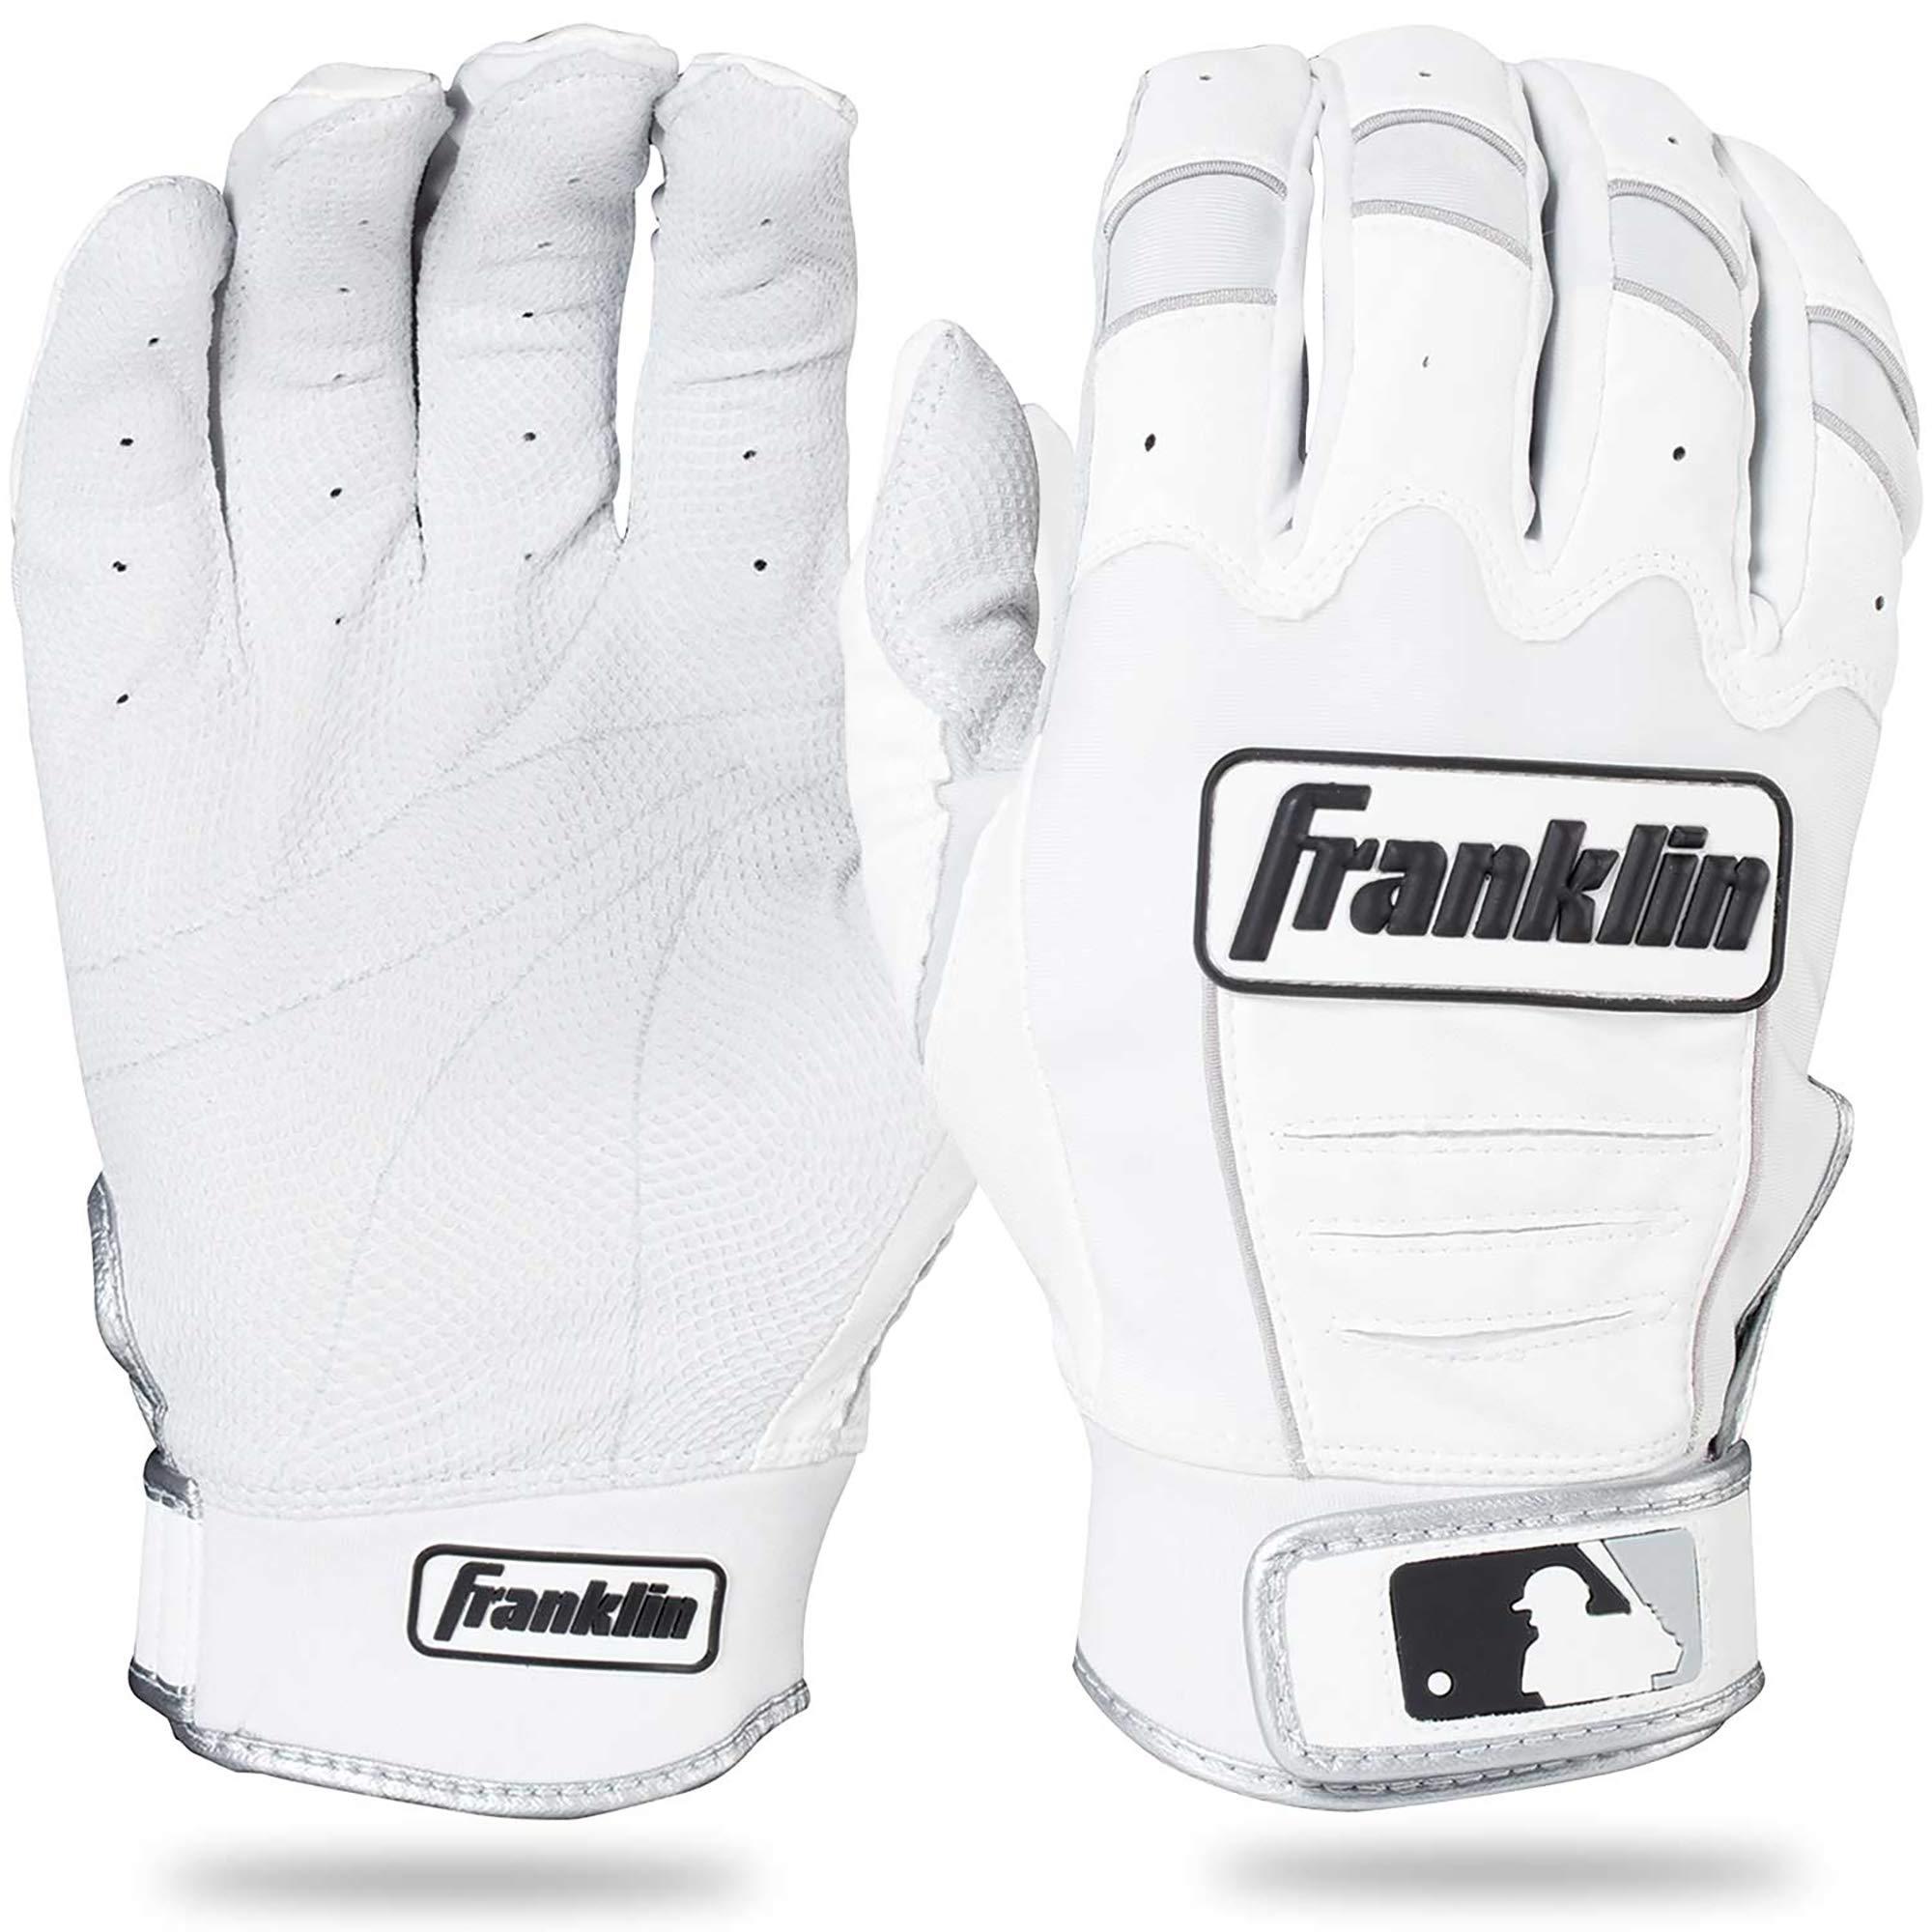 Best Rated in Baseball & Softball Batting Gloves & Helpful